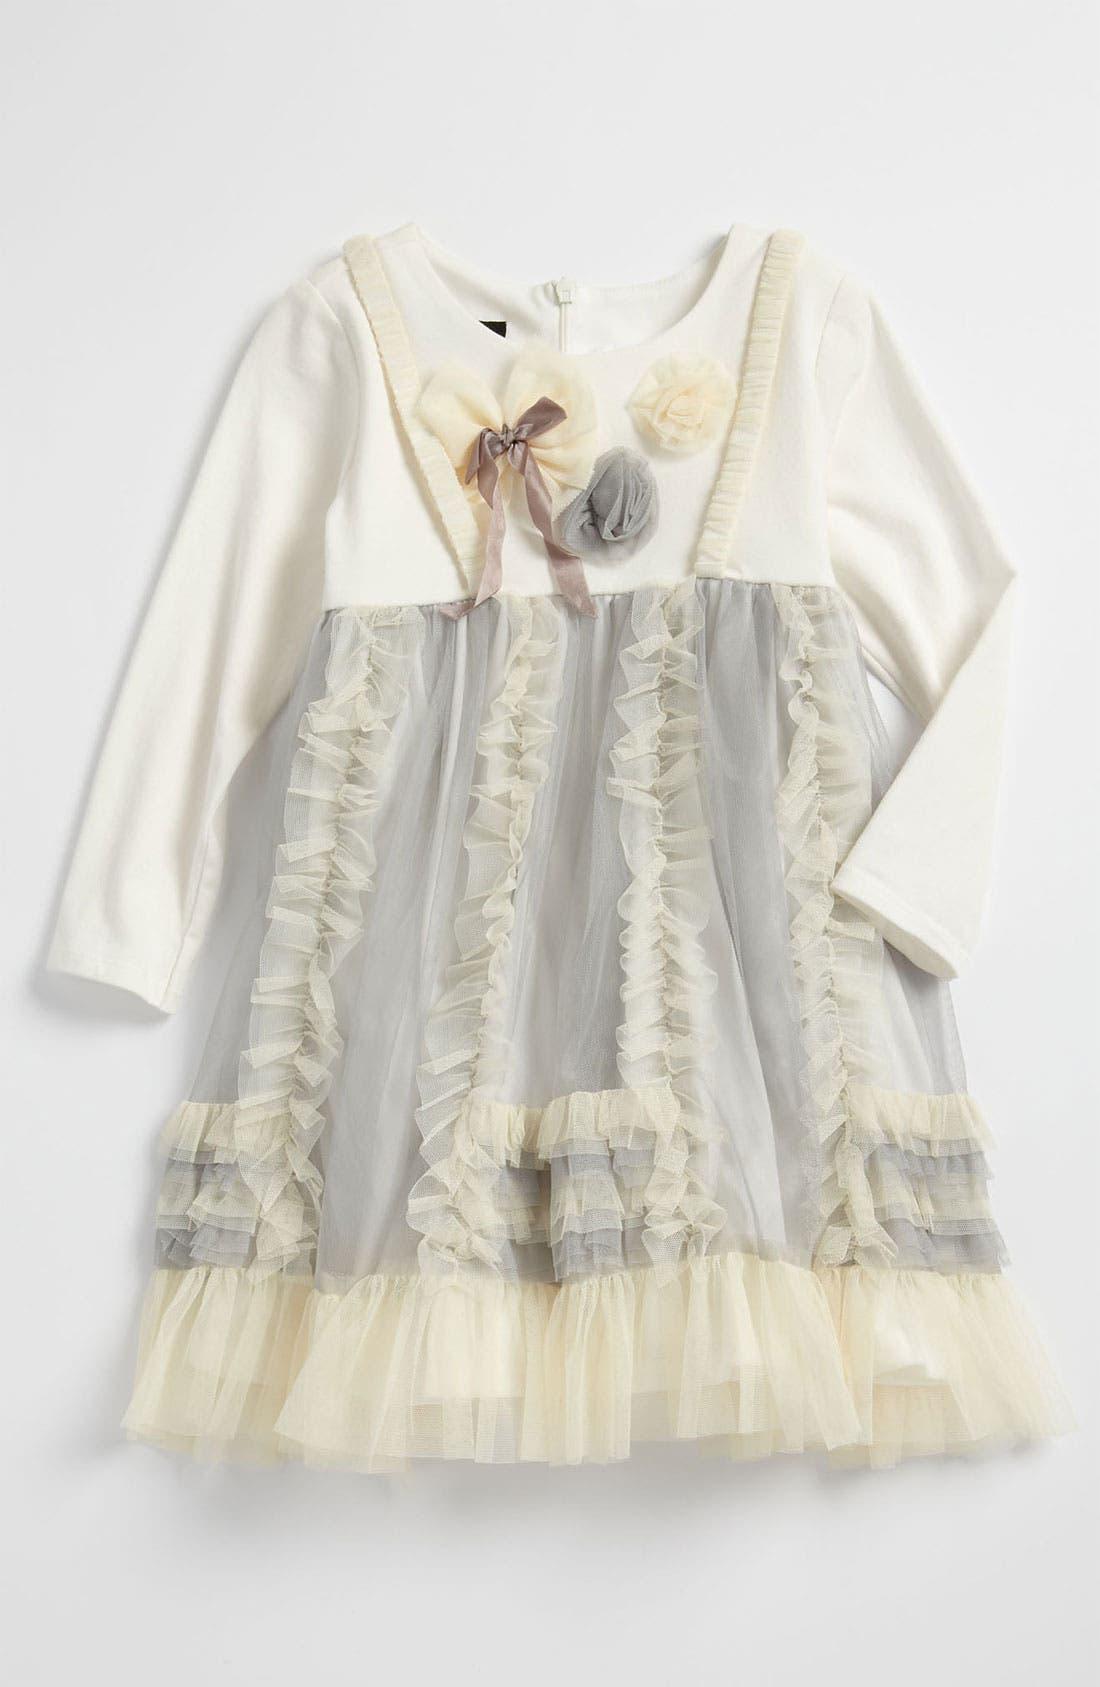 Main Image - Isobella & Chloe Mesh Dress (Toddler)